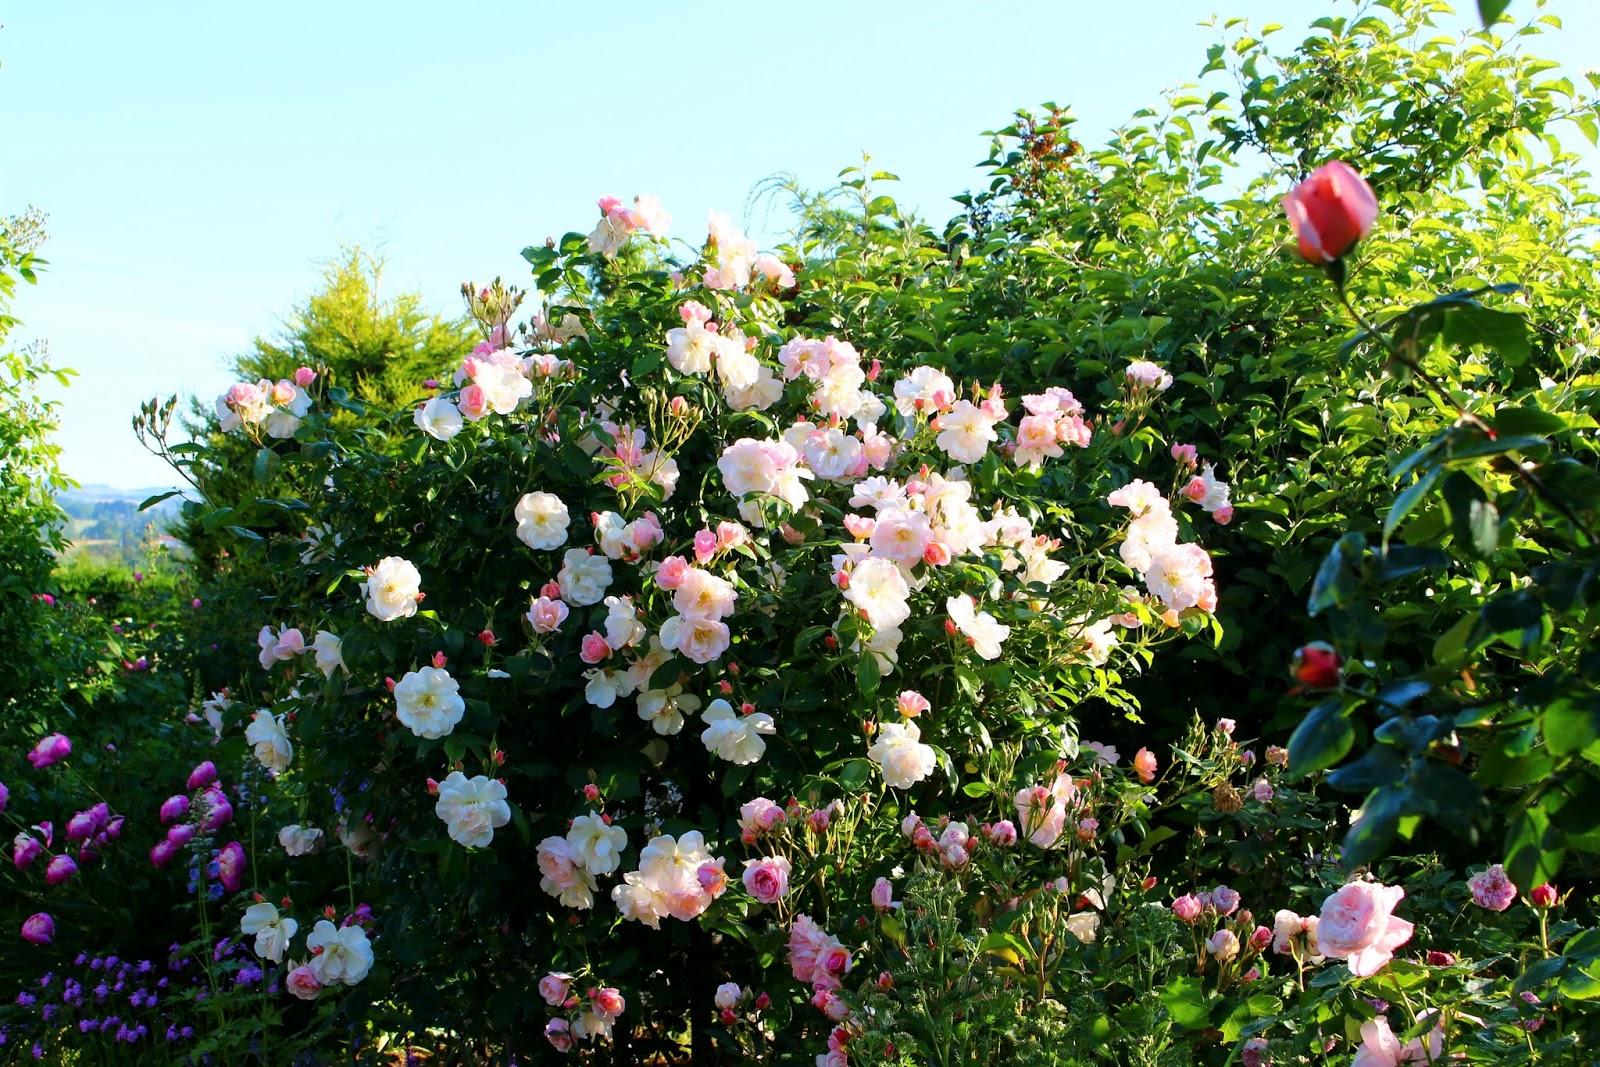 roses du jardin ch neland rosier sourire d 39 orchid e. Black Bedroom Furniture Sets. Home Design Ideas